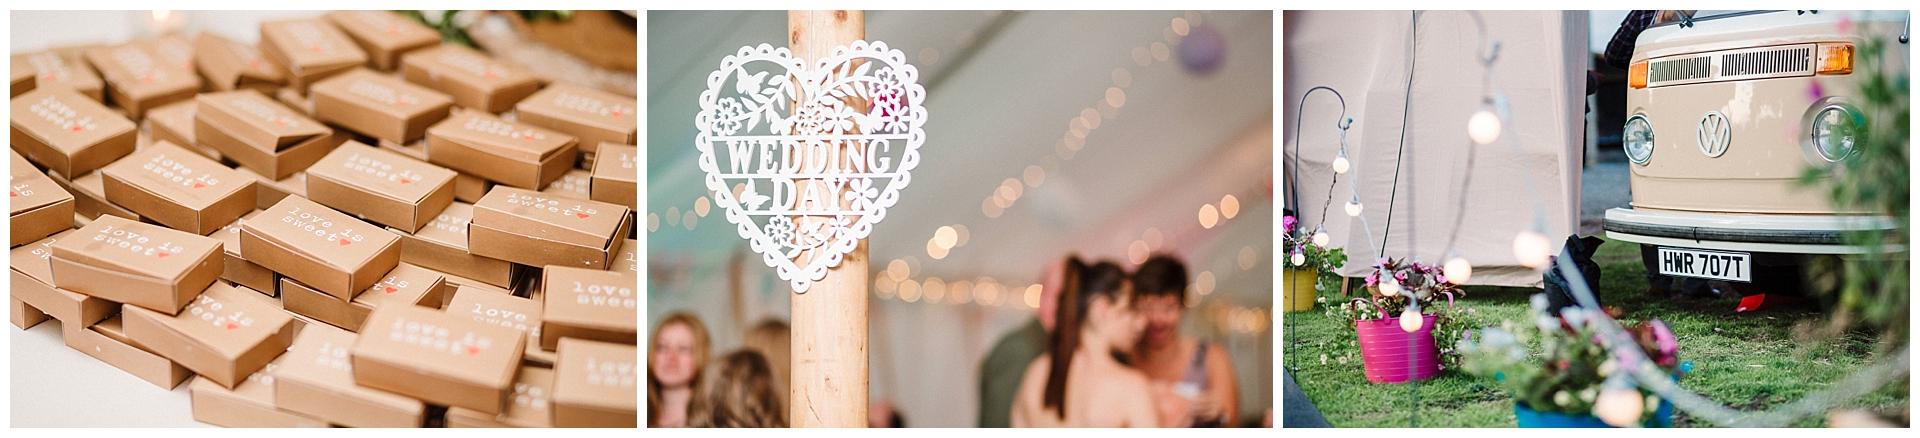 hip to heart wedding photography yorkshire-20.jpg